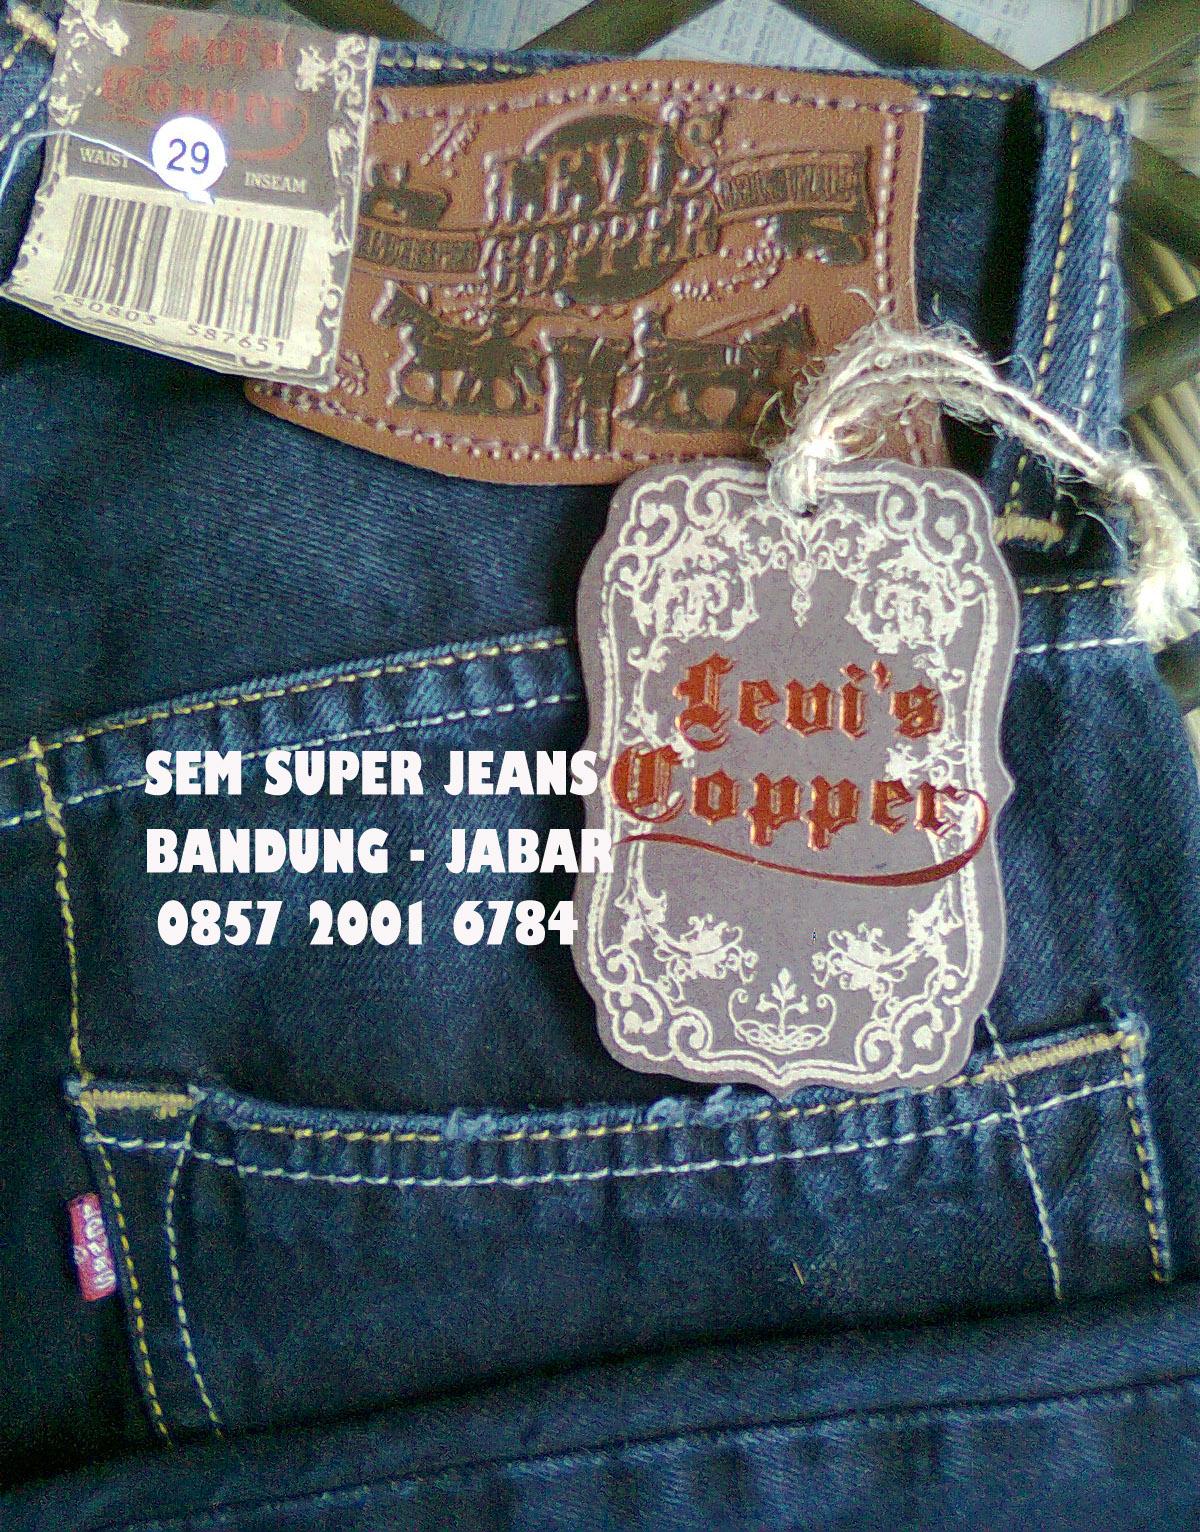 CELANA JEANS LEVI'S COPPER 501 ORIGINALS | (example: Best